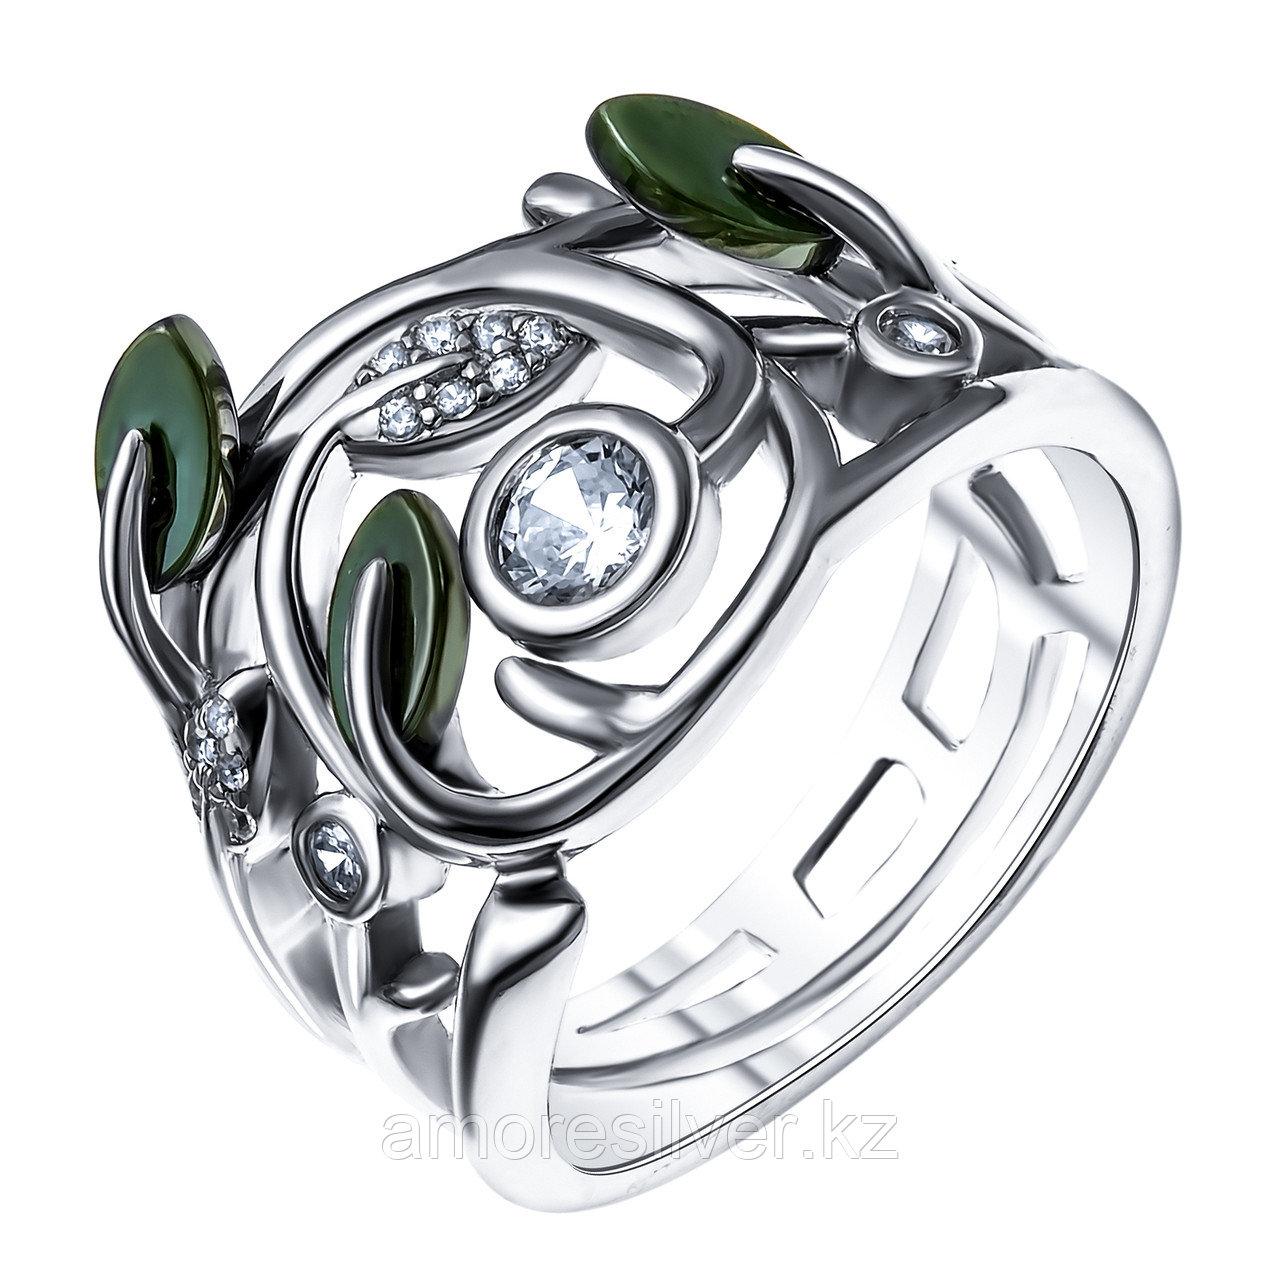 Кольцо Teosa серебро с родием, керамика фианит, флора ZCR-2255-O